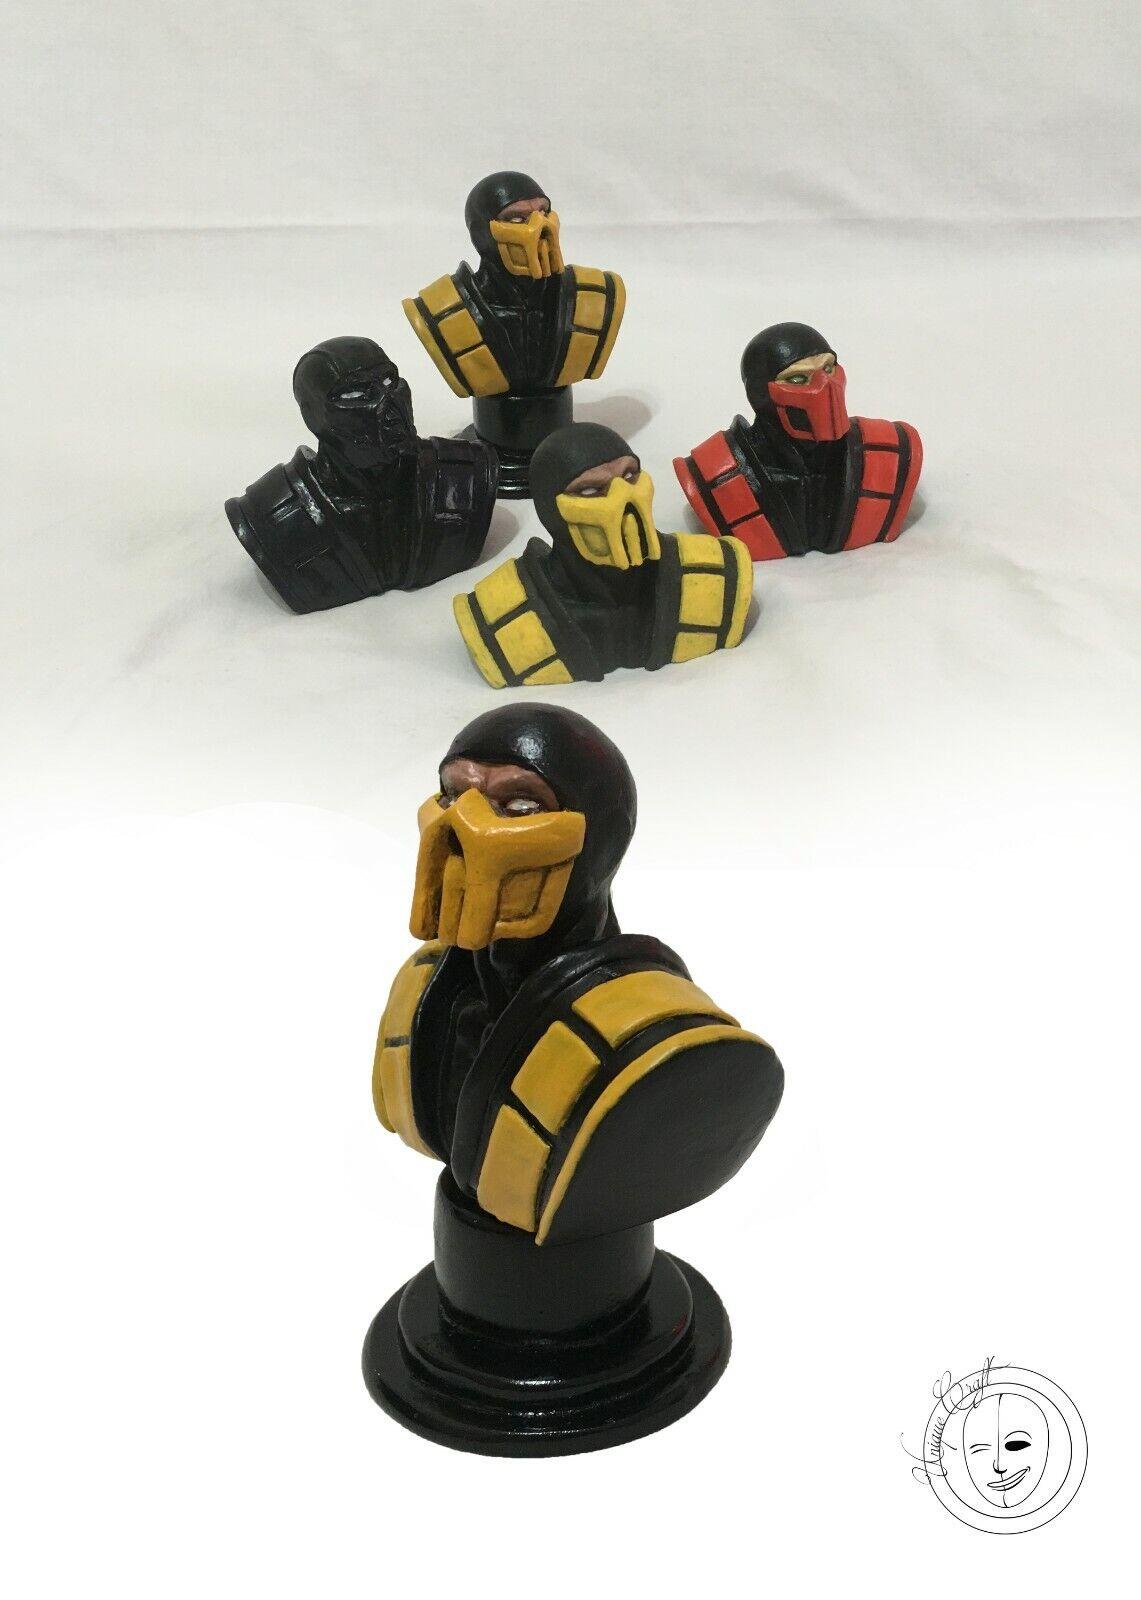 Mortal Kombat Scorpion, Mortal Kombat Ninja, Mortal Kombat Fan Art,